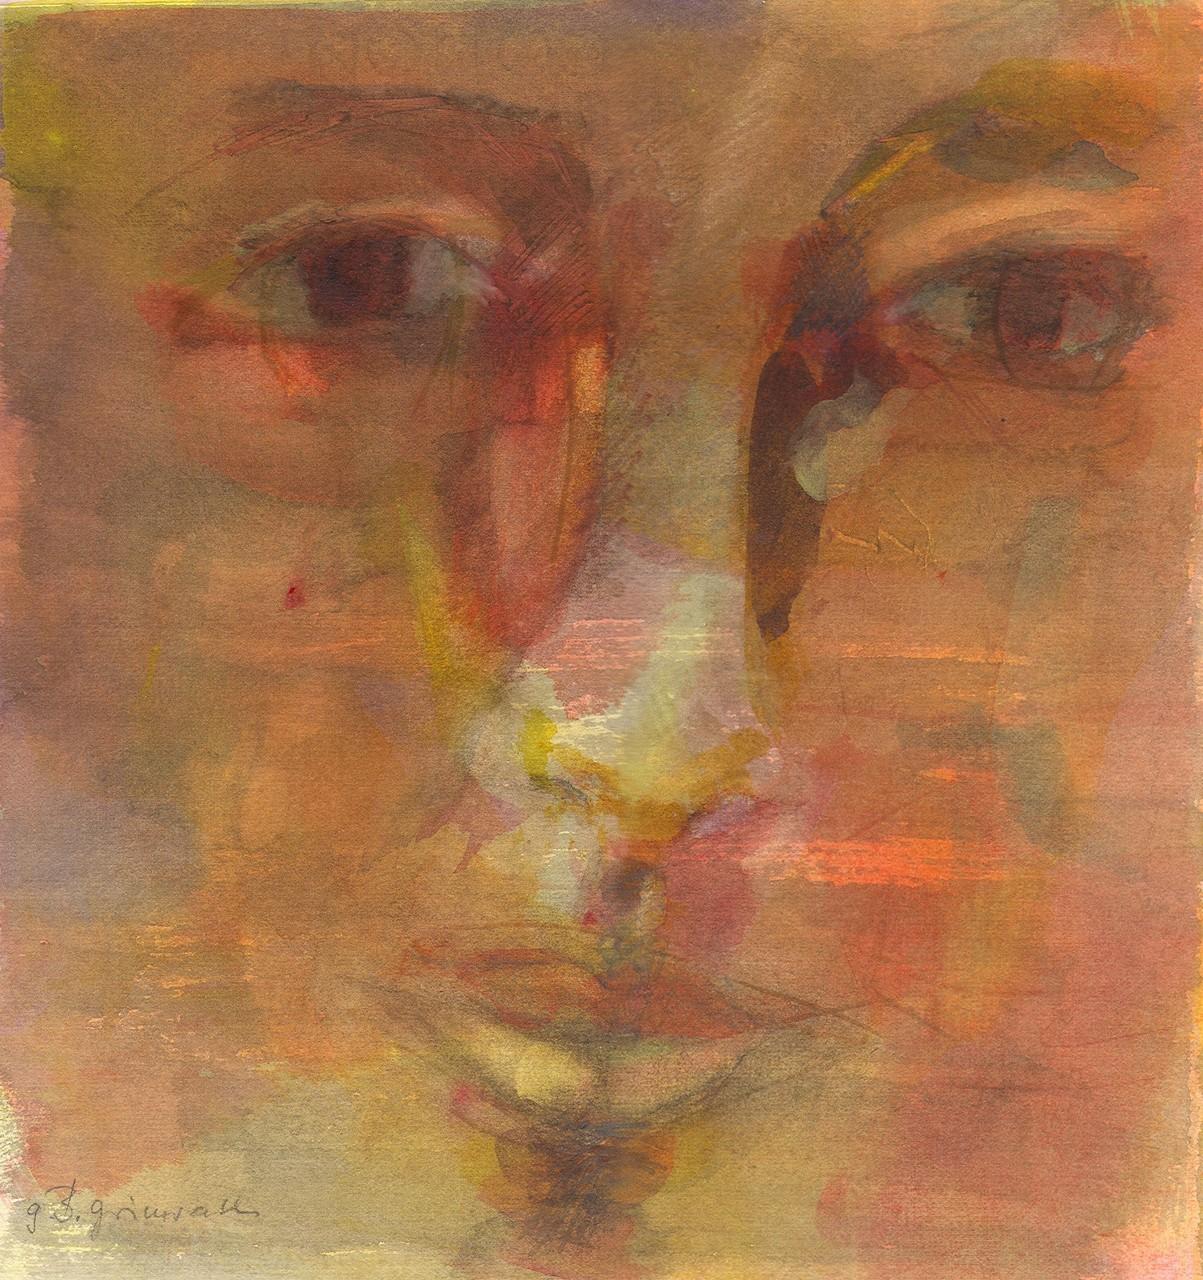 Augenblick, Aquarell und Stifte, 30 x 30 cm